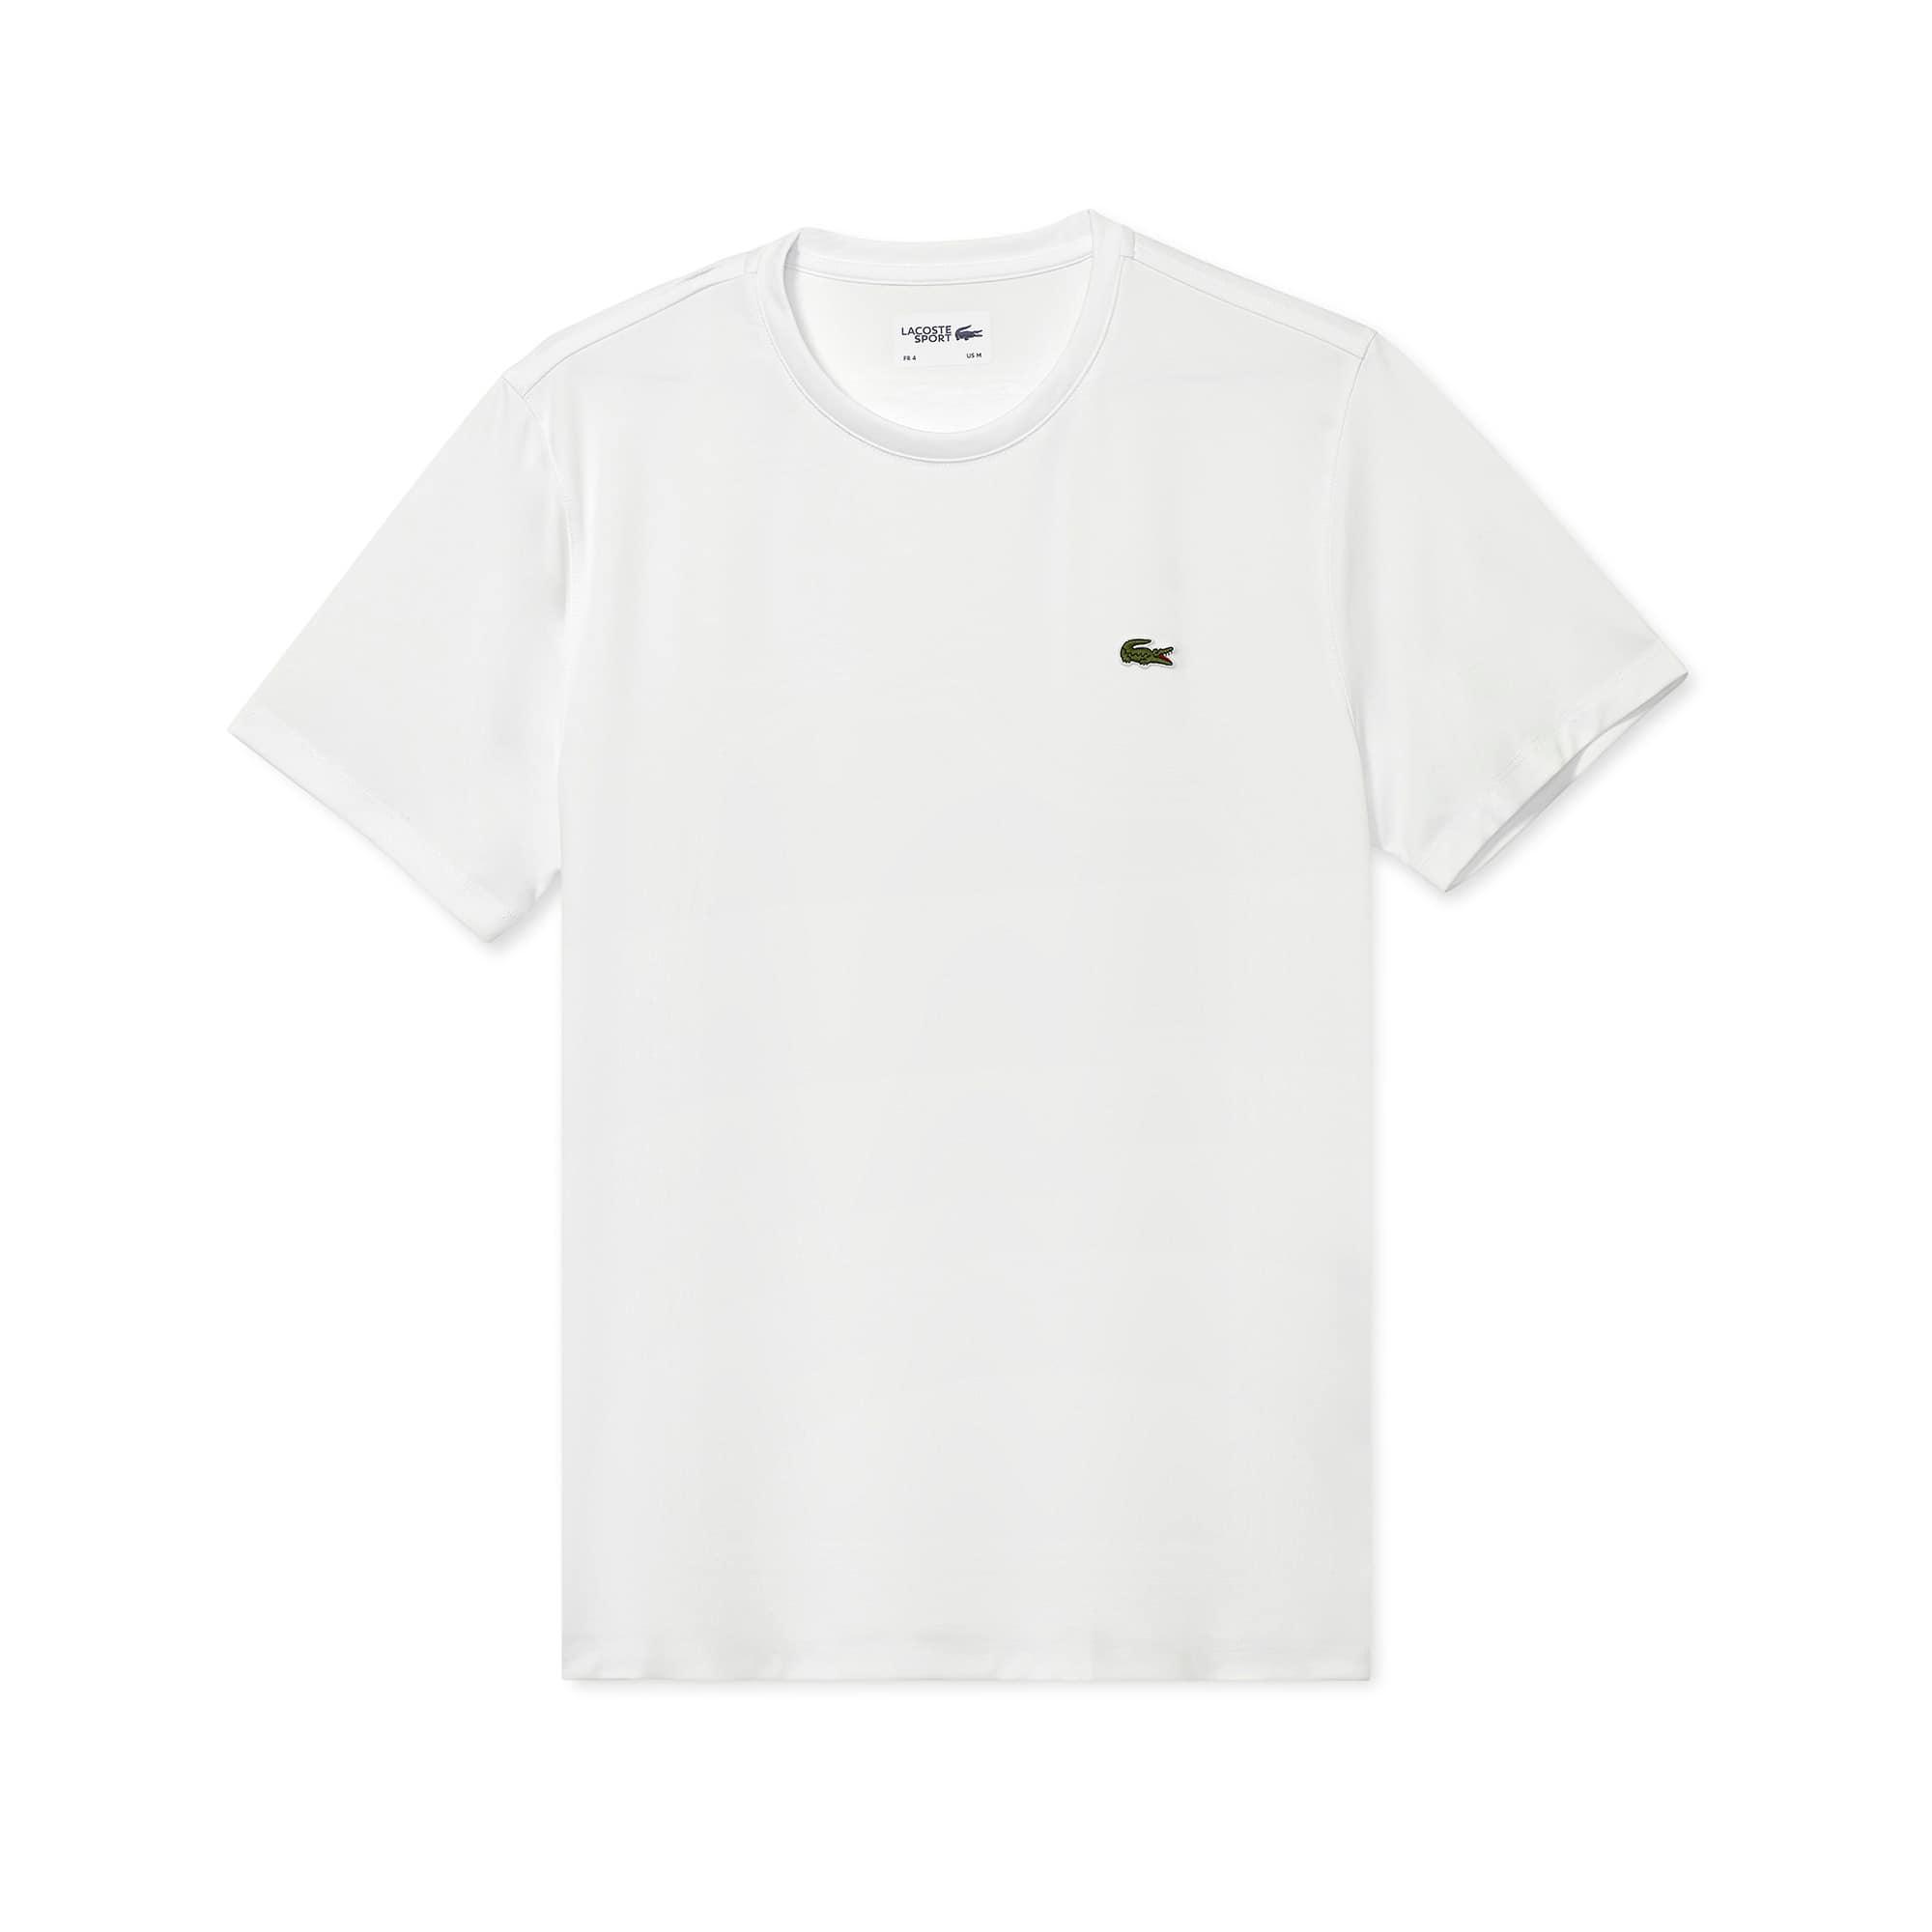 Camiseta Lacoste masculina técnica 5736b815d64f0